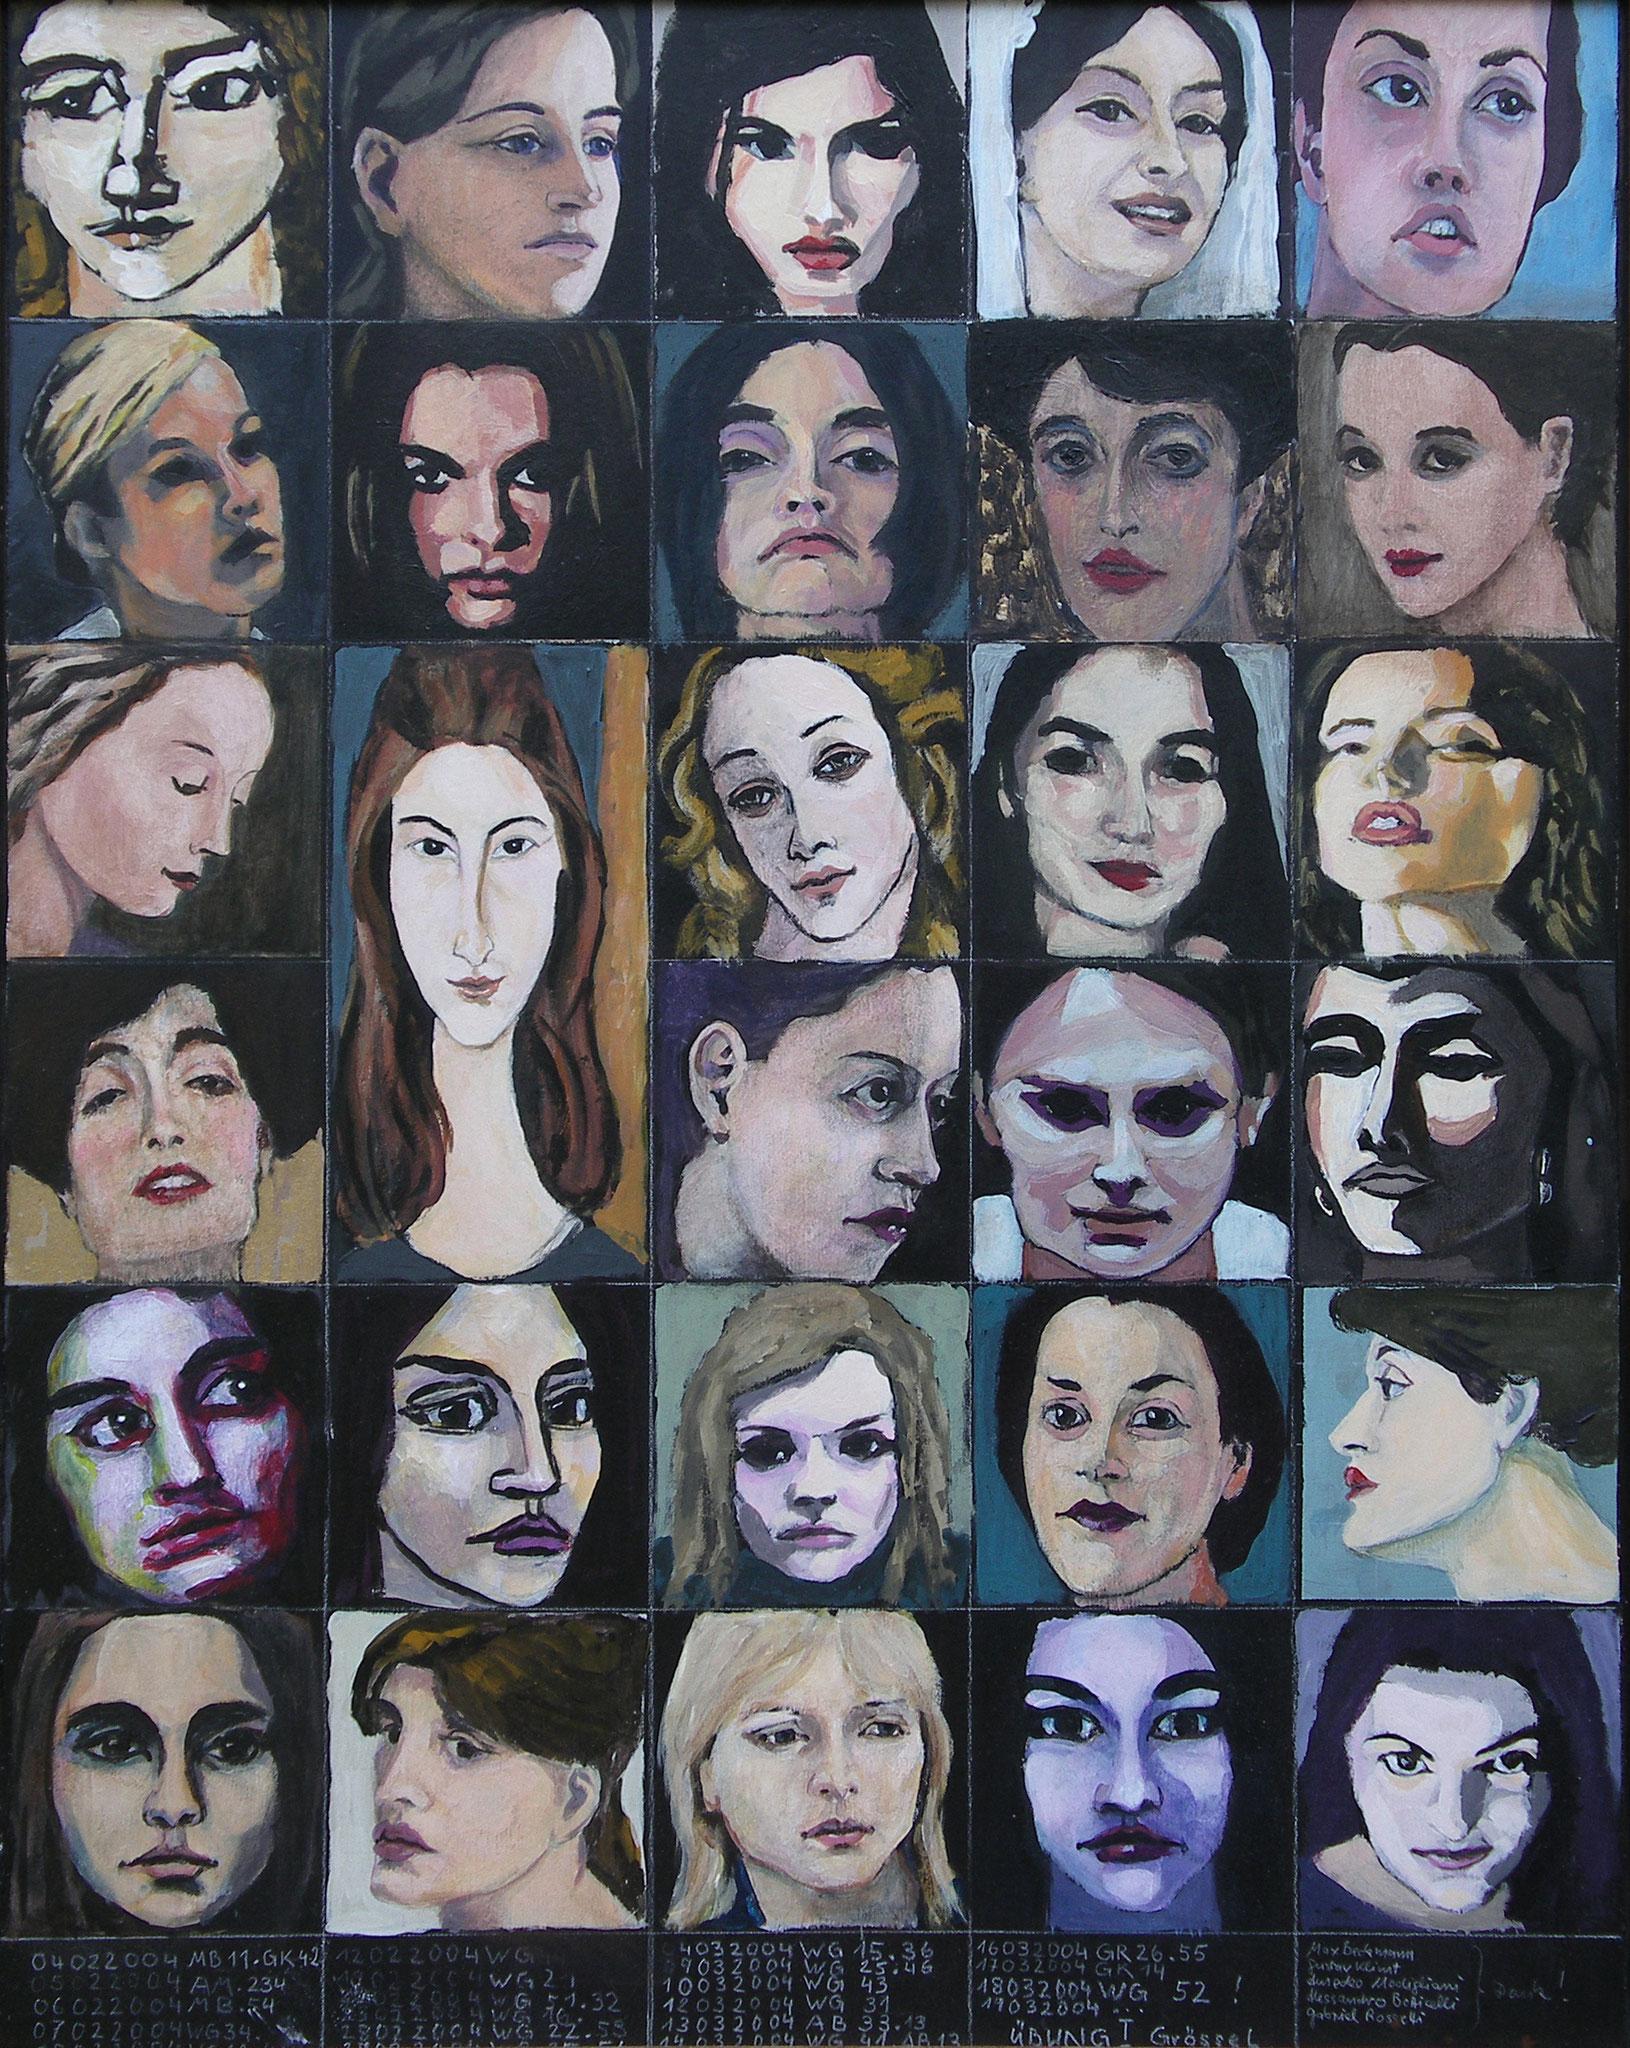 """29 Köpfe"", Acryl auf Papier auf Holz, 64x50,5, 2004"